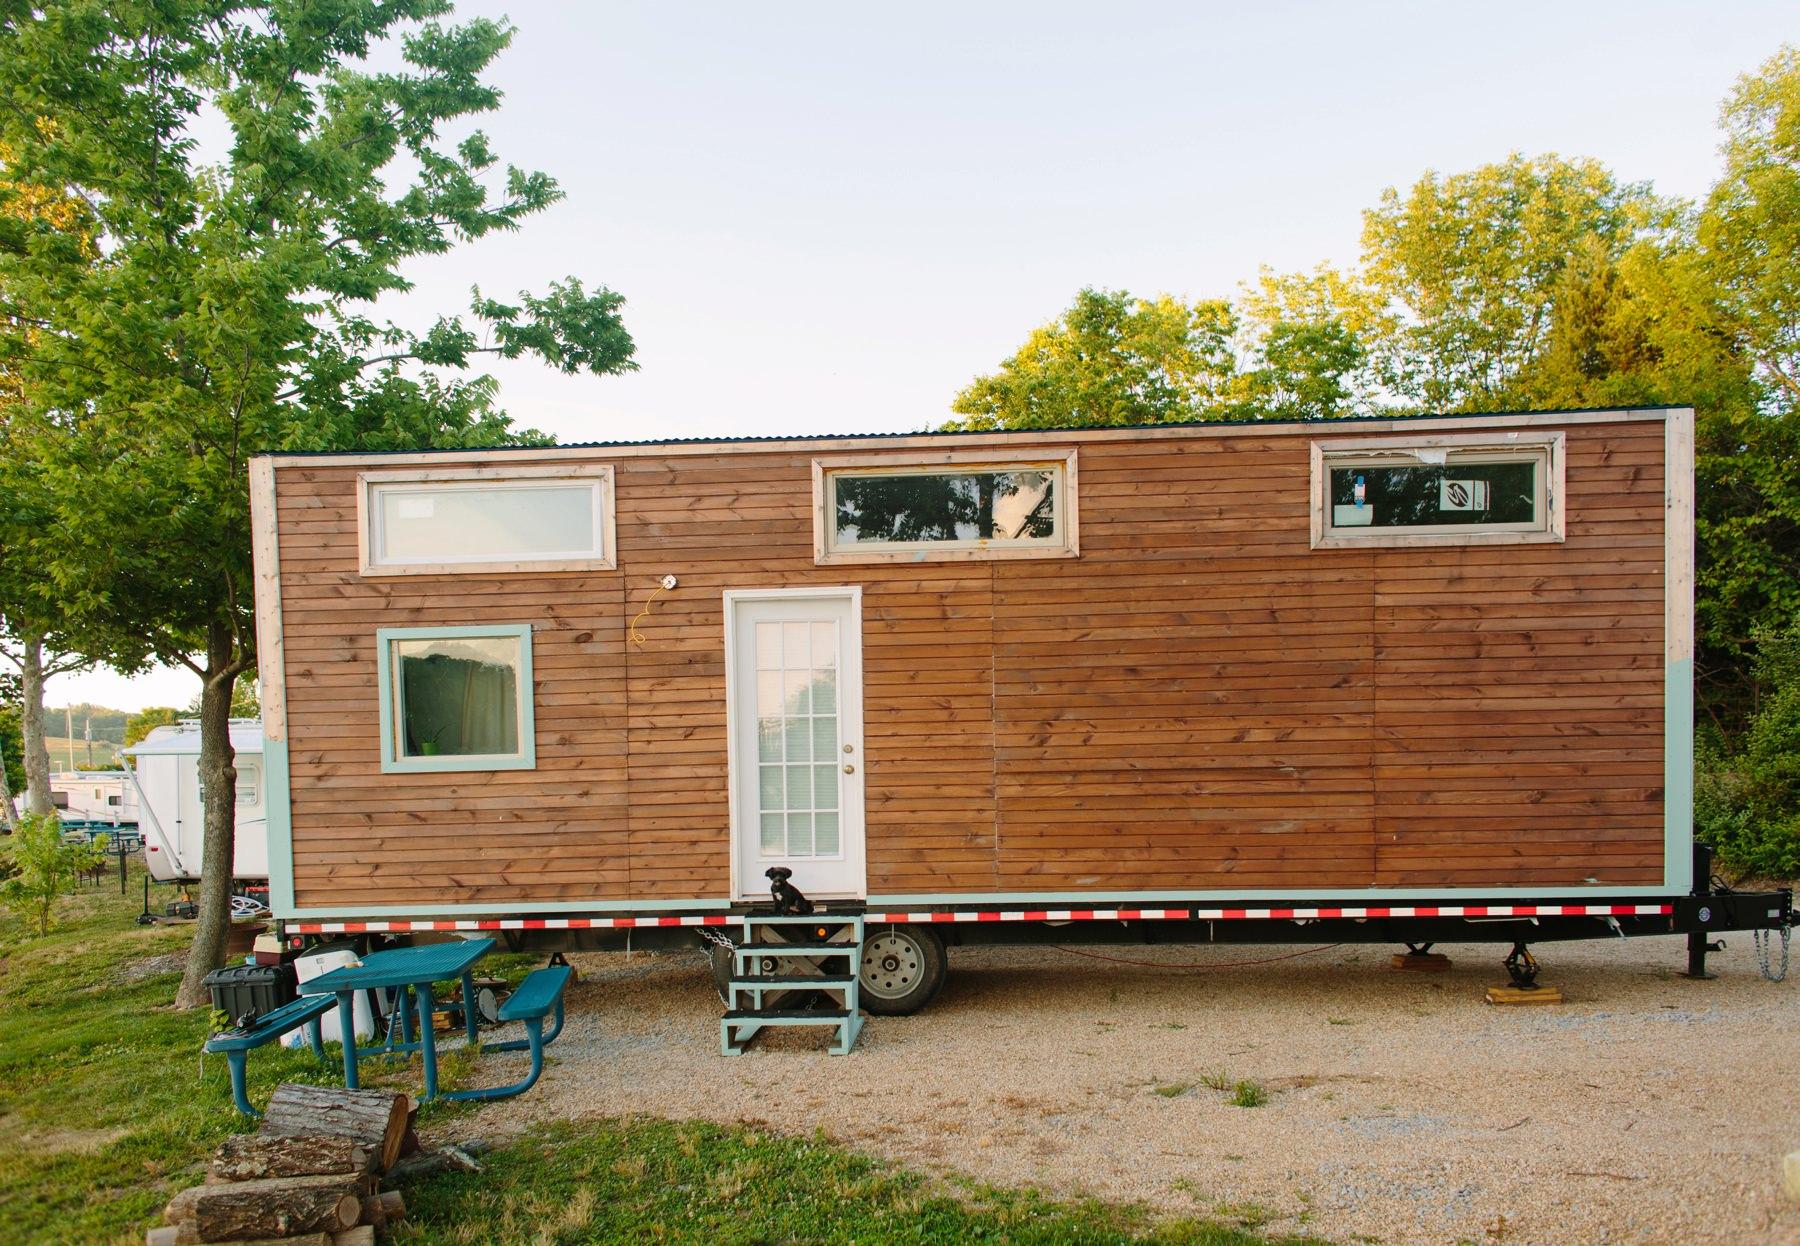 Tiny Home Designs: Cincinnati, Ohio - Tire Swing